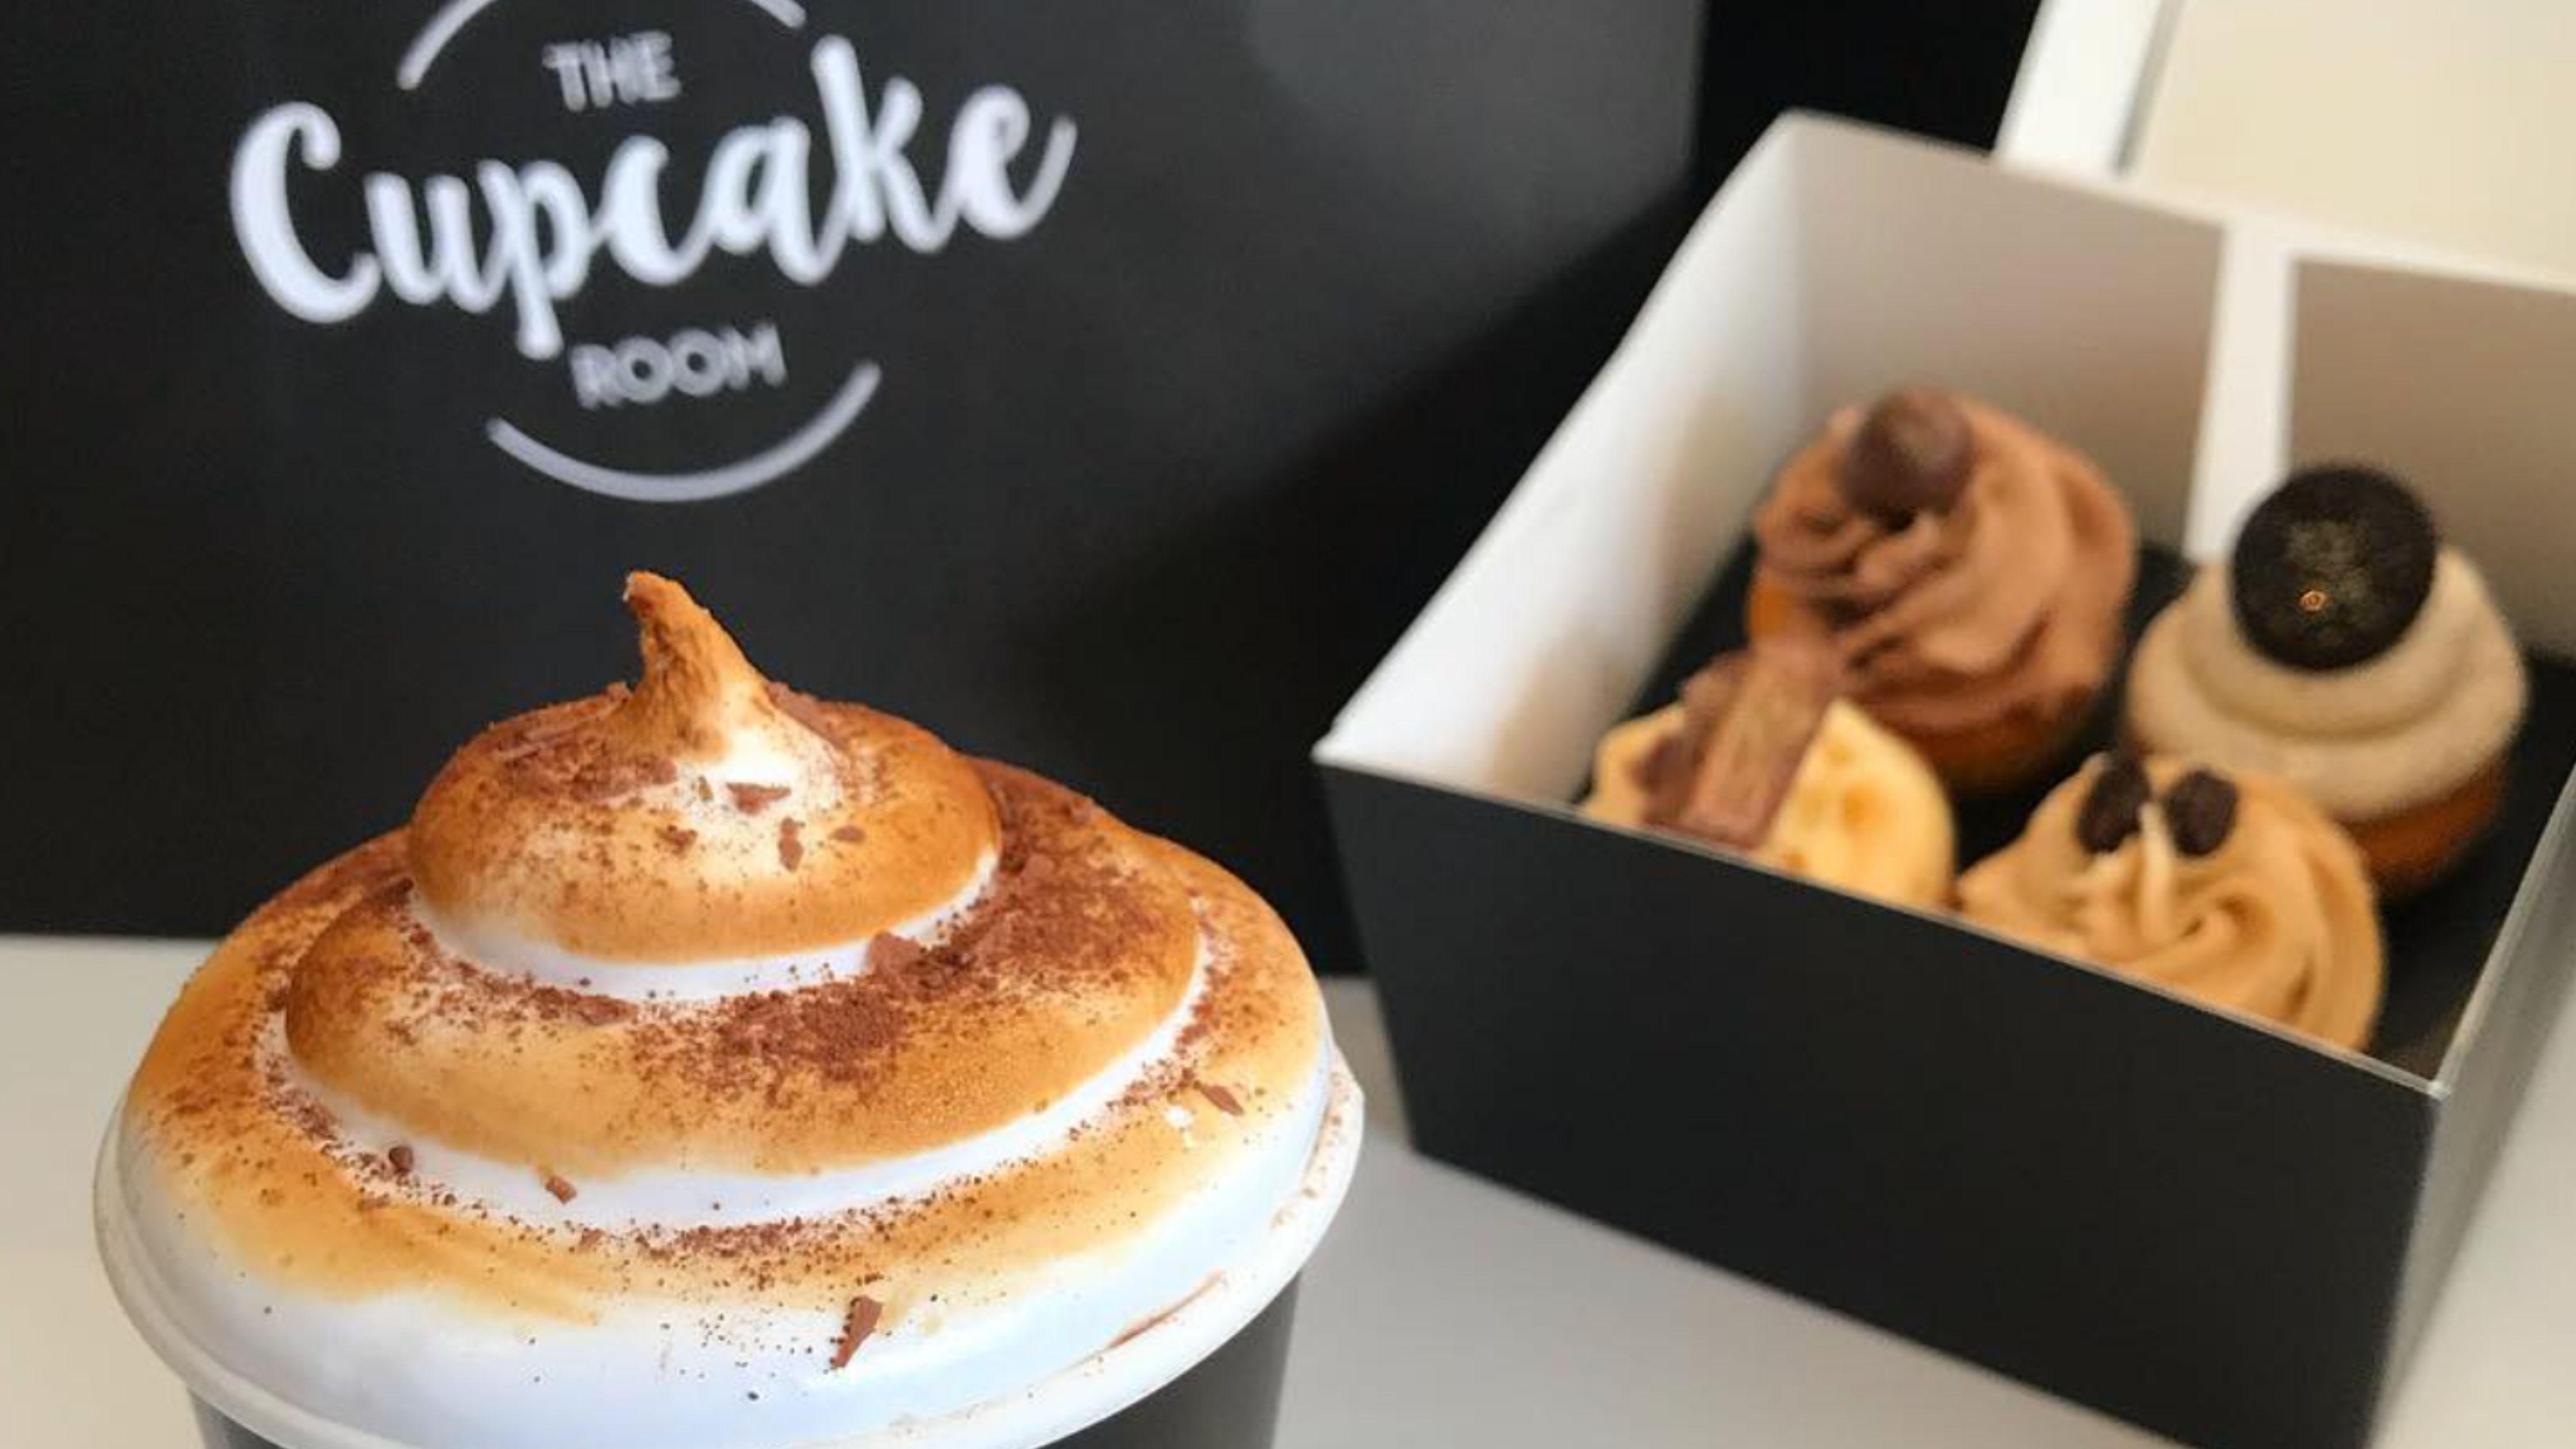 the cupcake room cupcakes